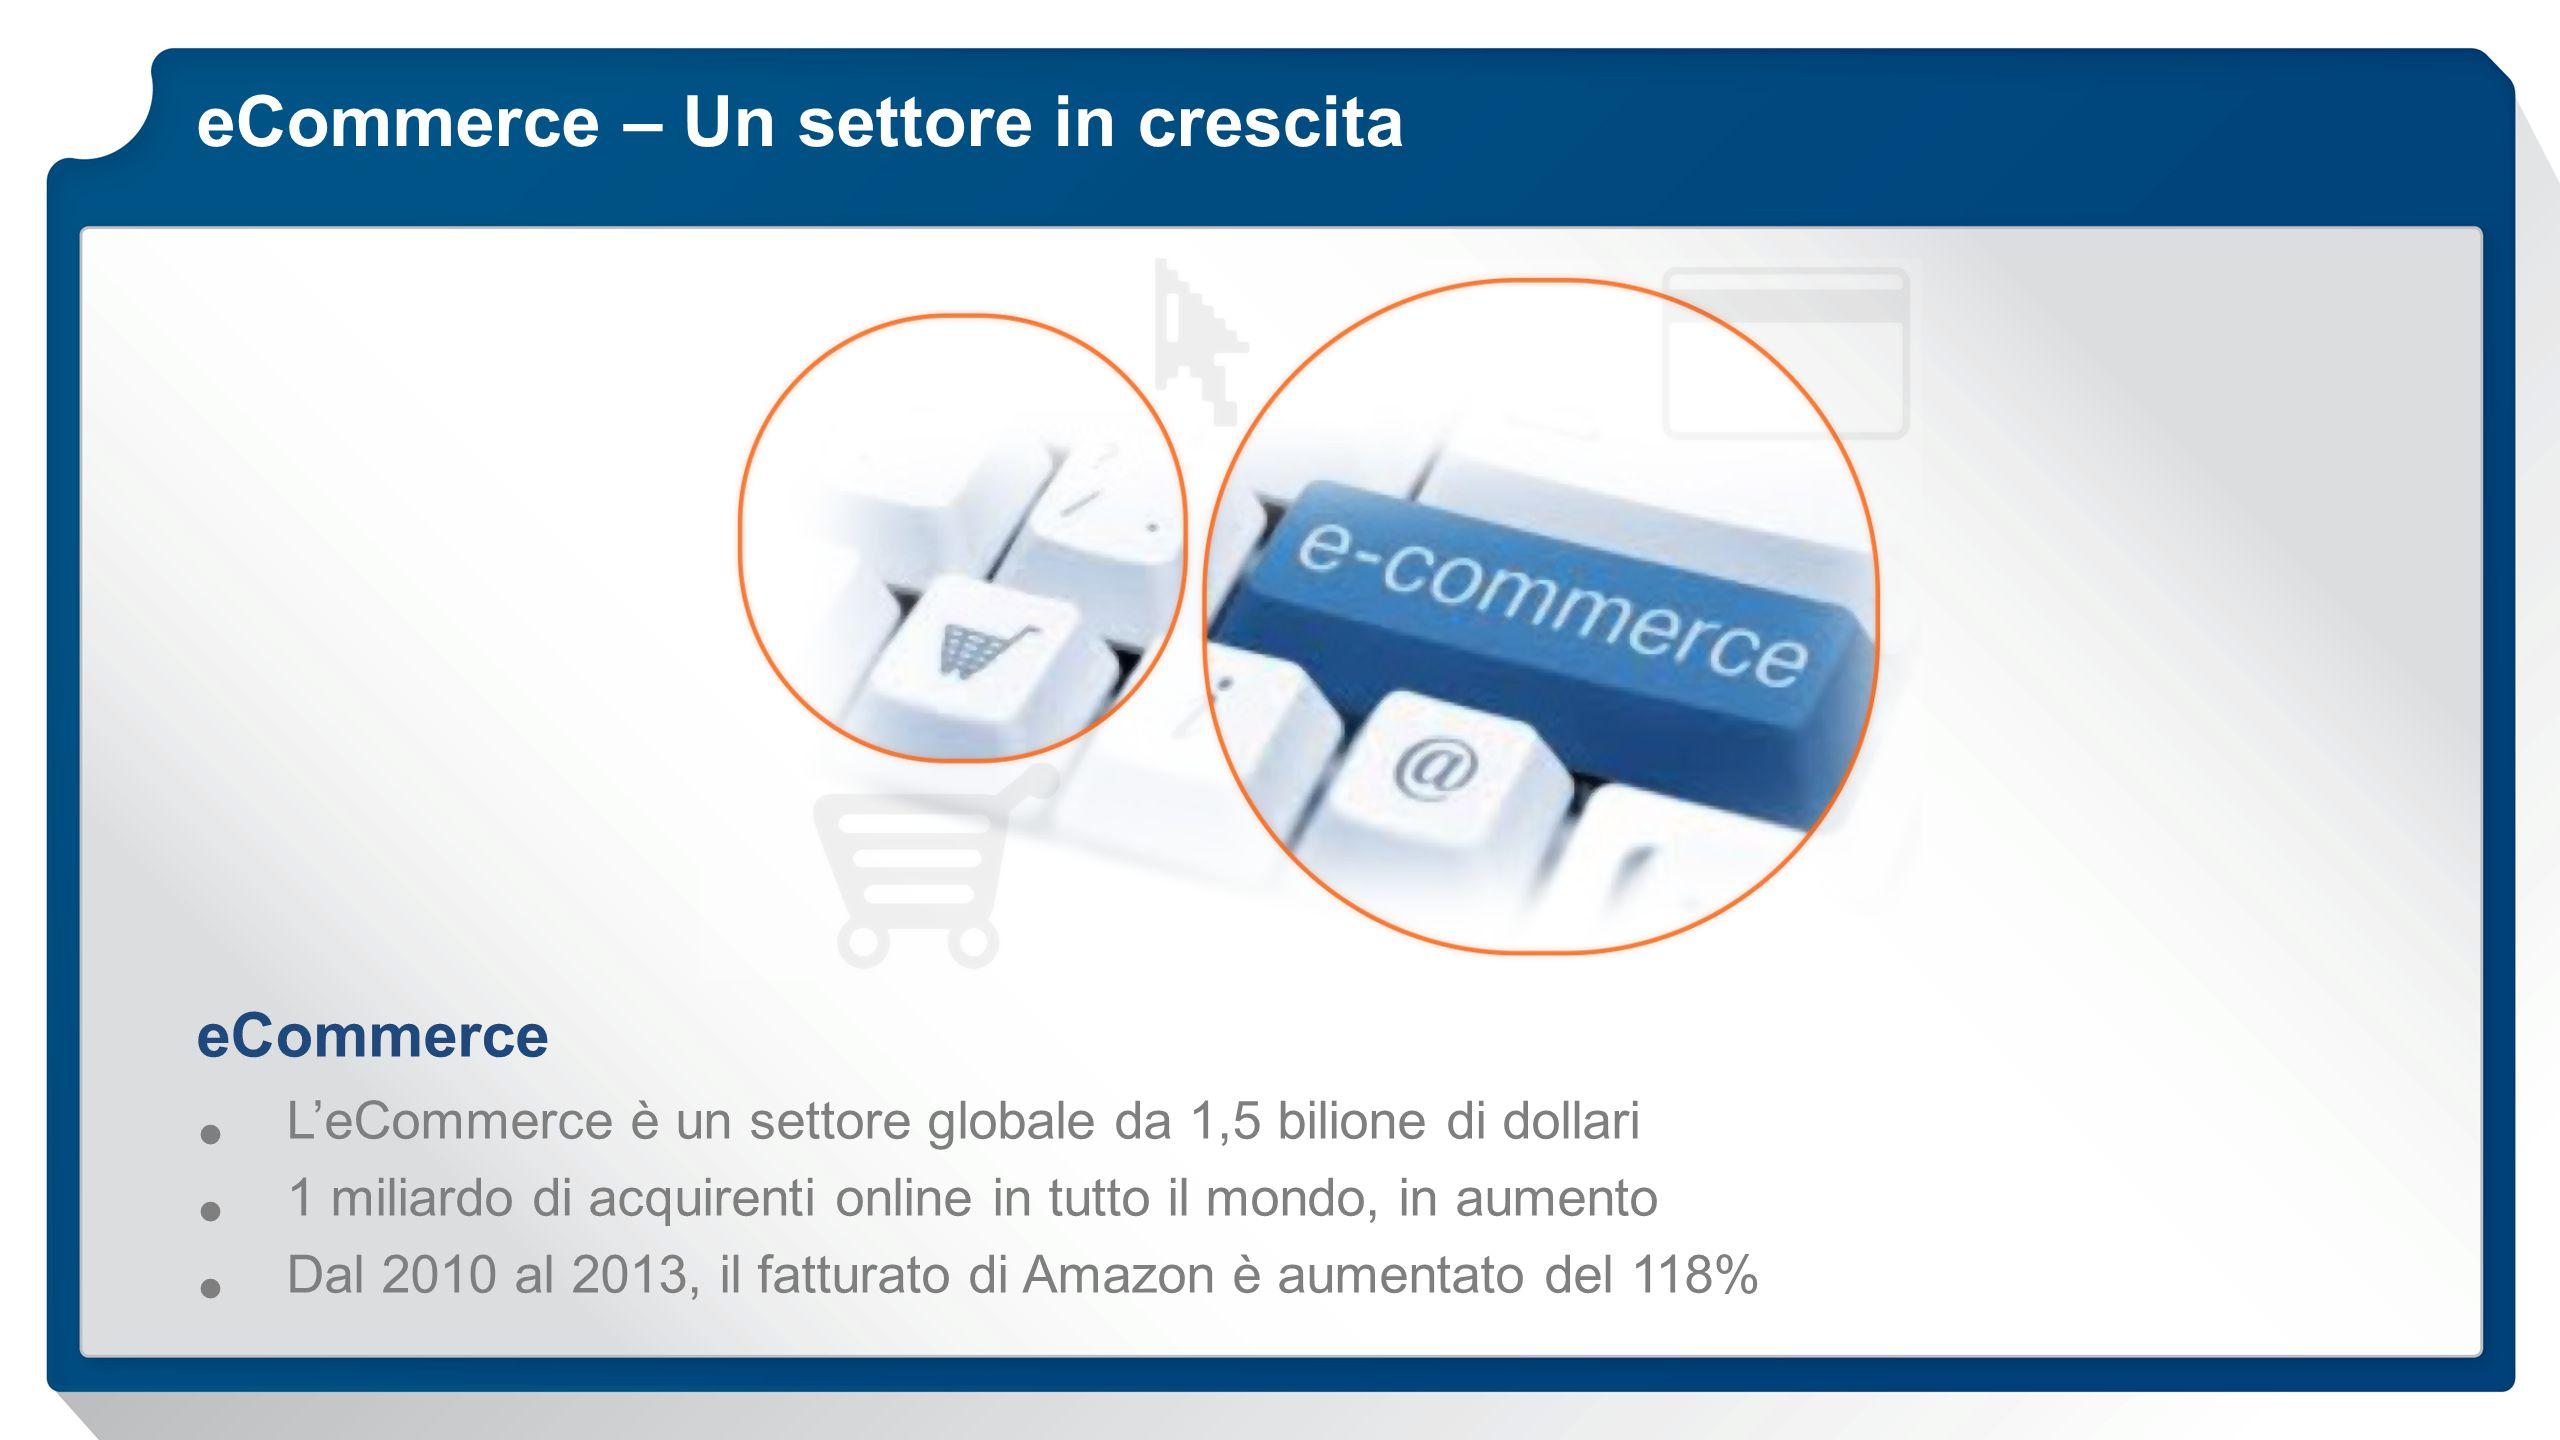 eCommerce – Un settore in crescita